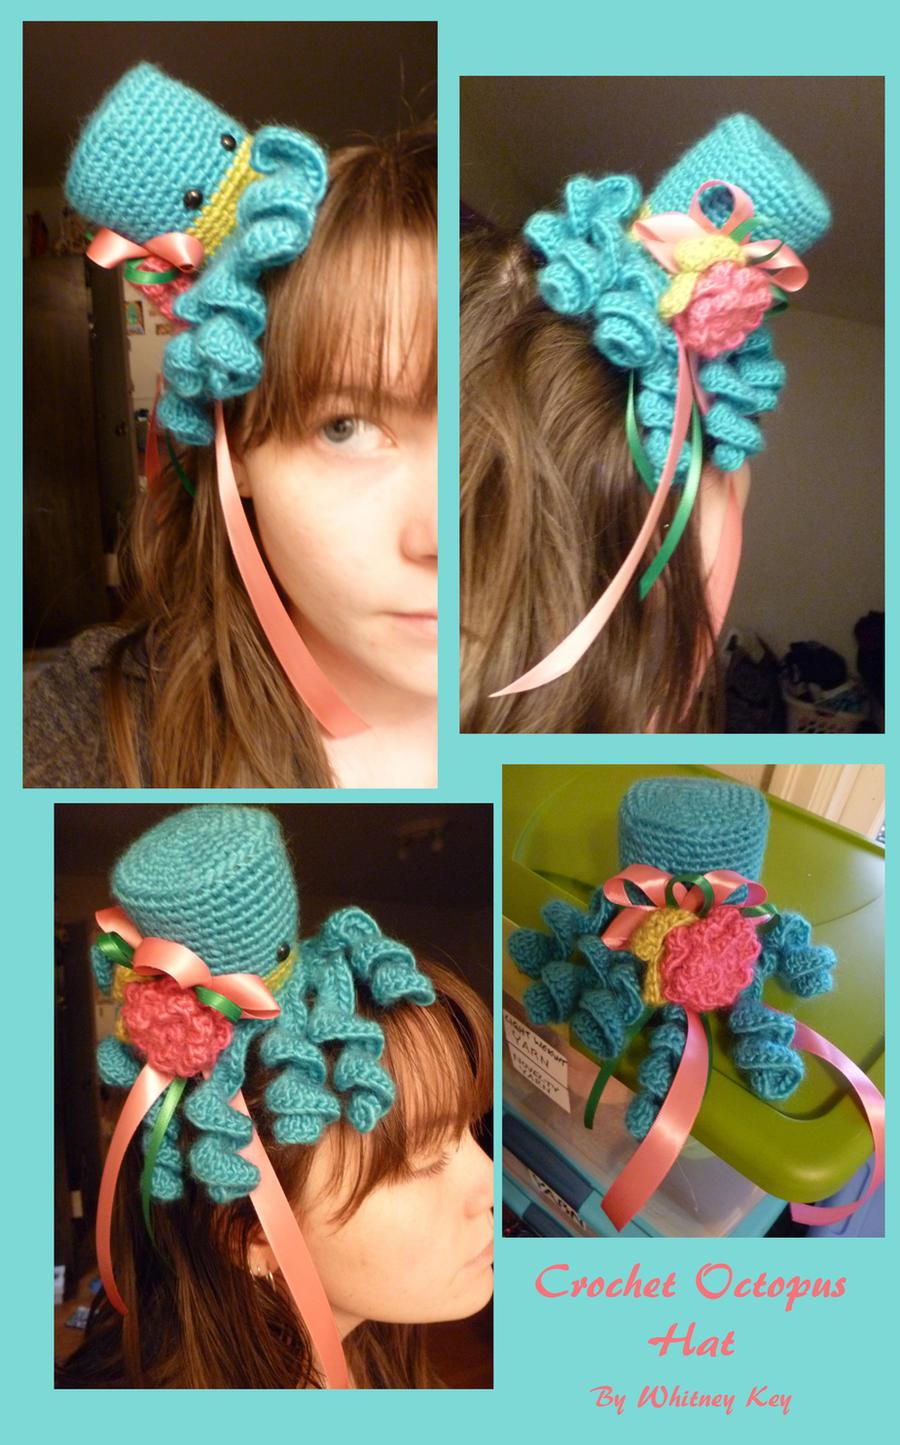 Tiny Crochet Octopus Top Hat by Merlend on DeviantArt